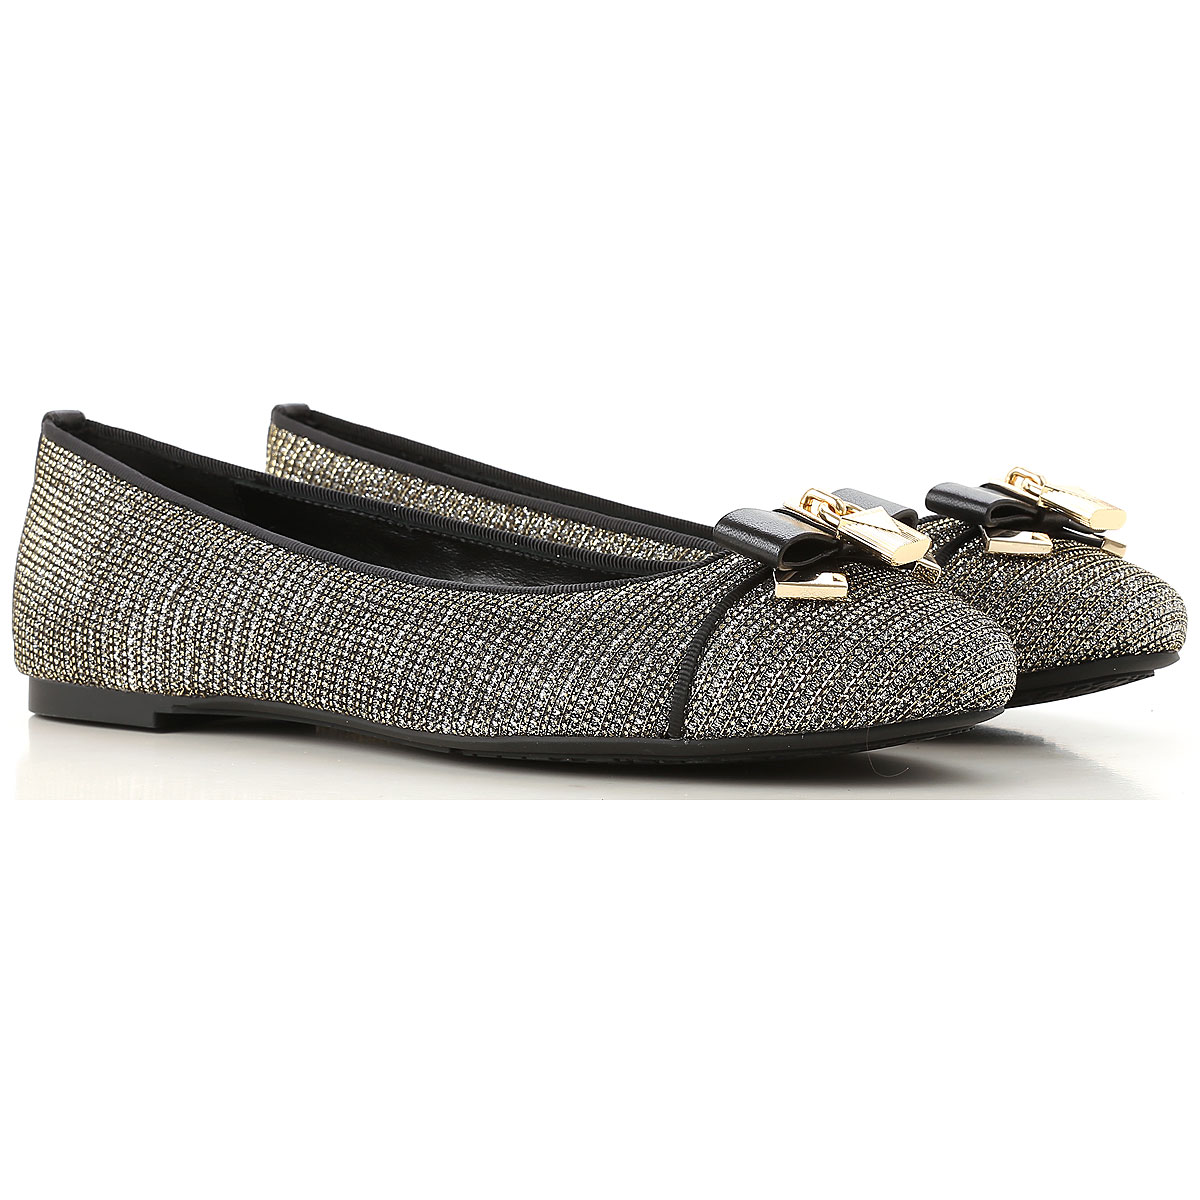 Image of Michael Kors Ballet Flats Ballerina Shoes for Women, Black, Leather, 2017, 6 6.5